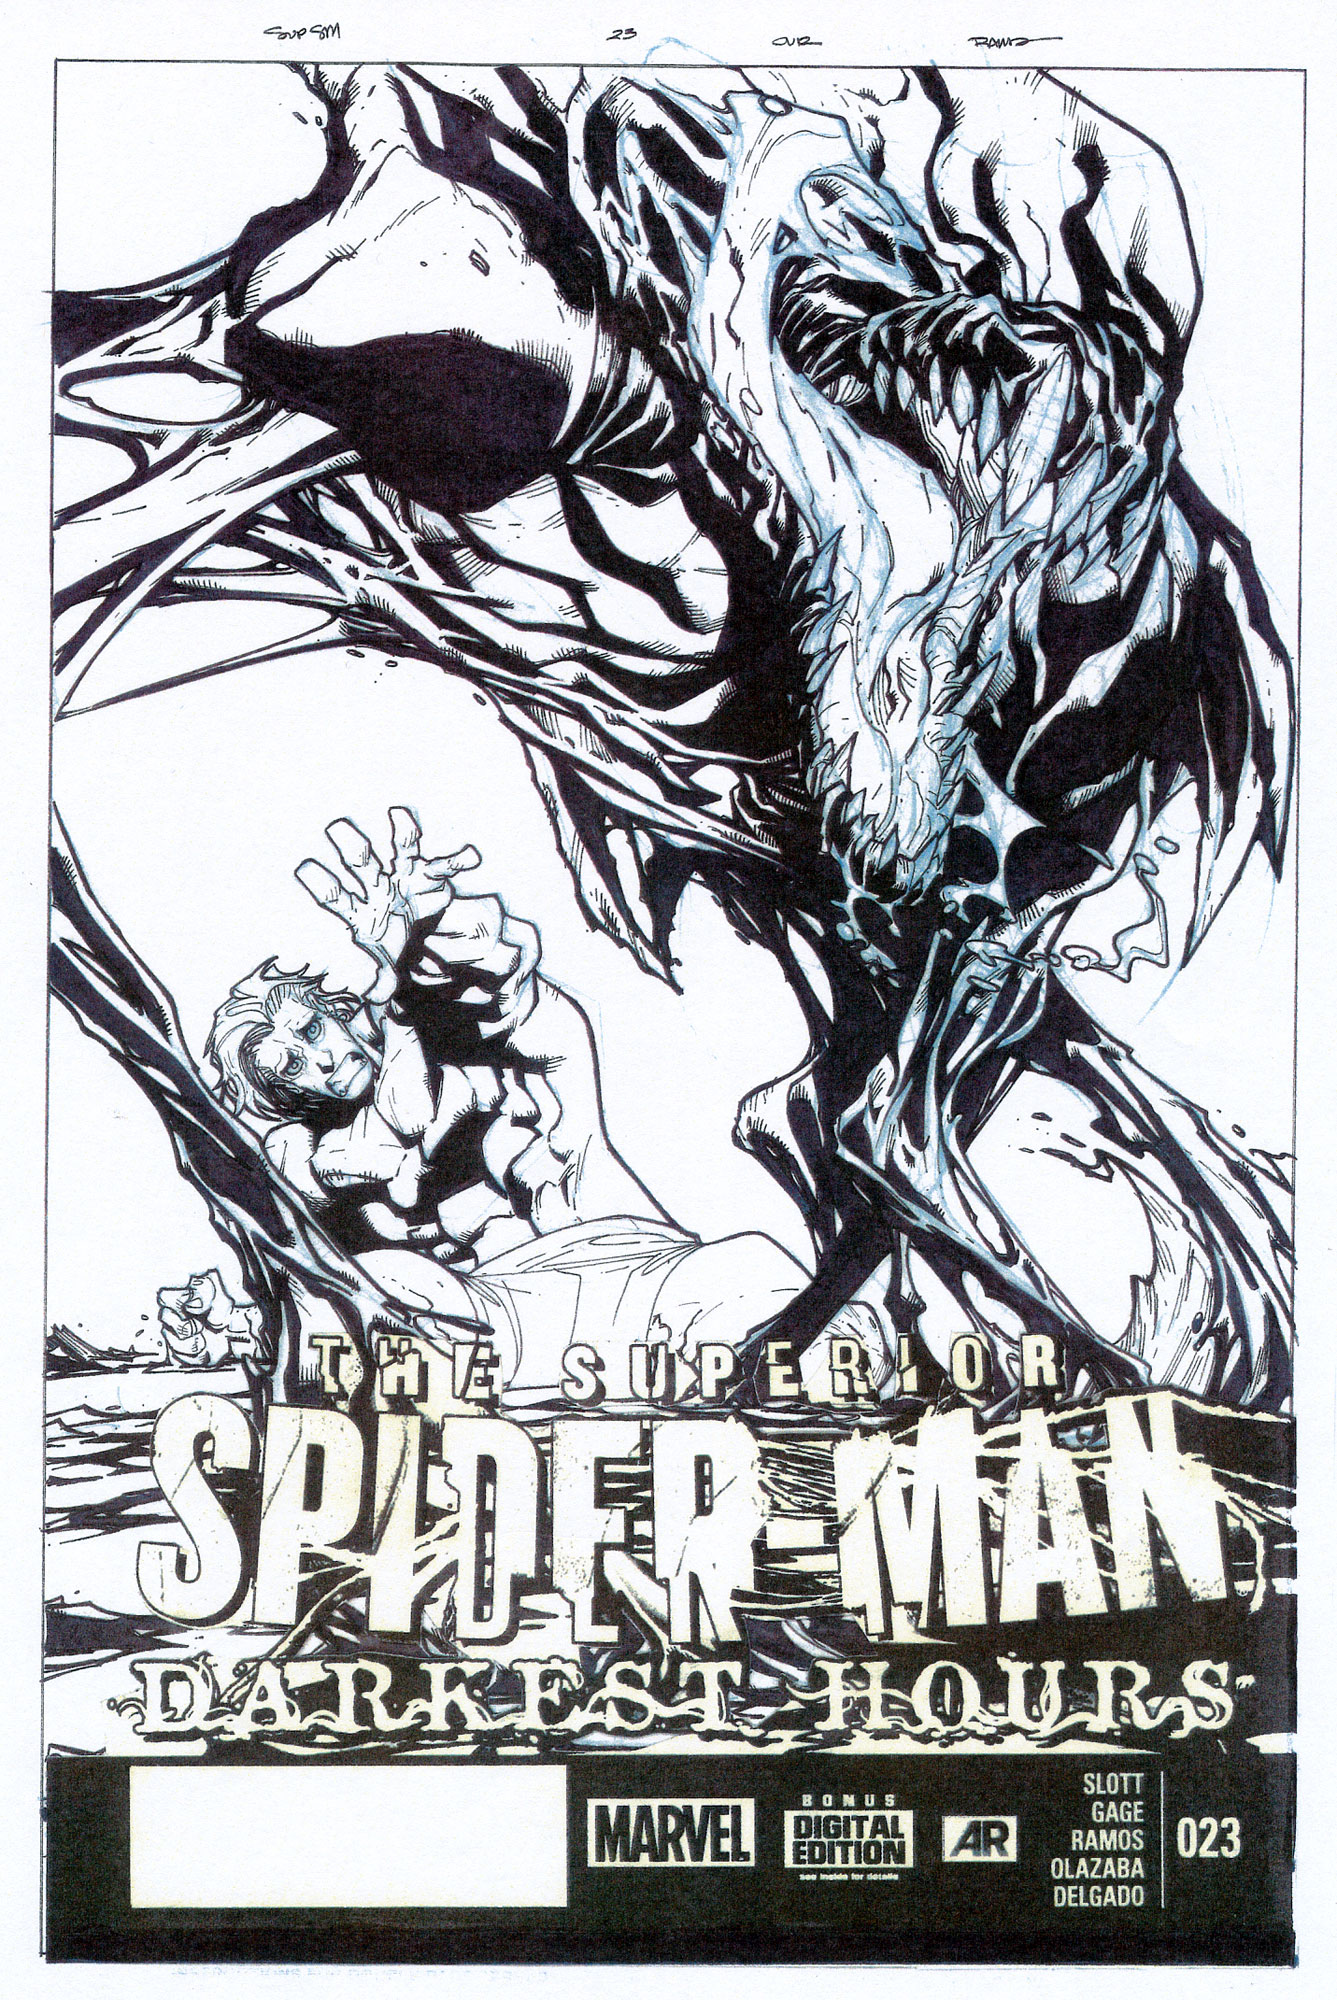 HUMBERTO RAMOS 2013 SUPERIOR SPIDER-MAN #23 COVER Comic Art